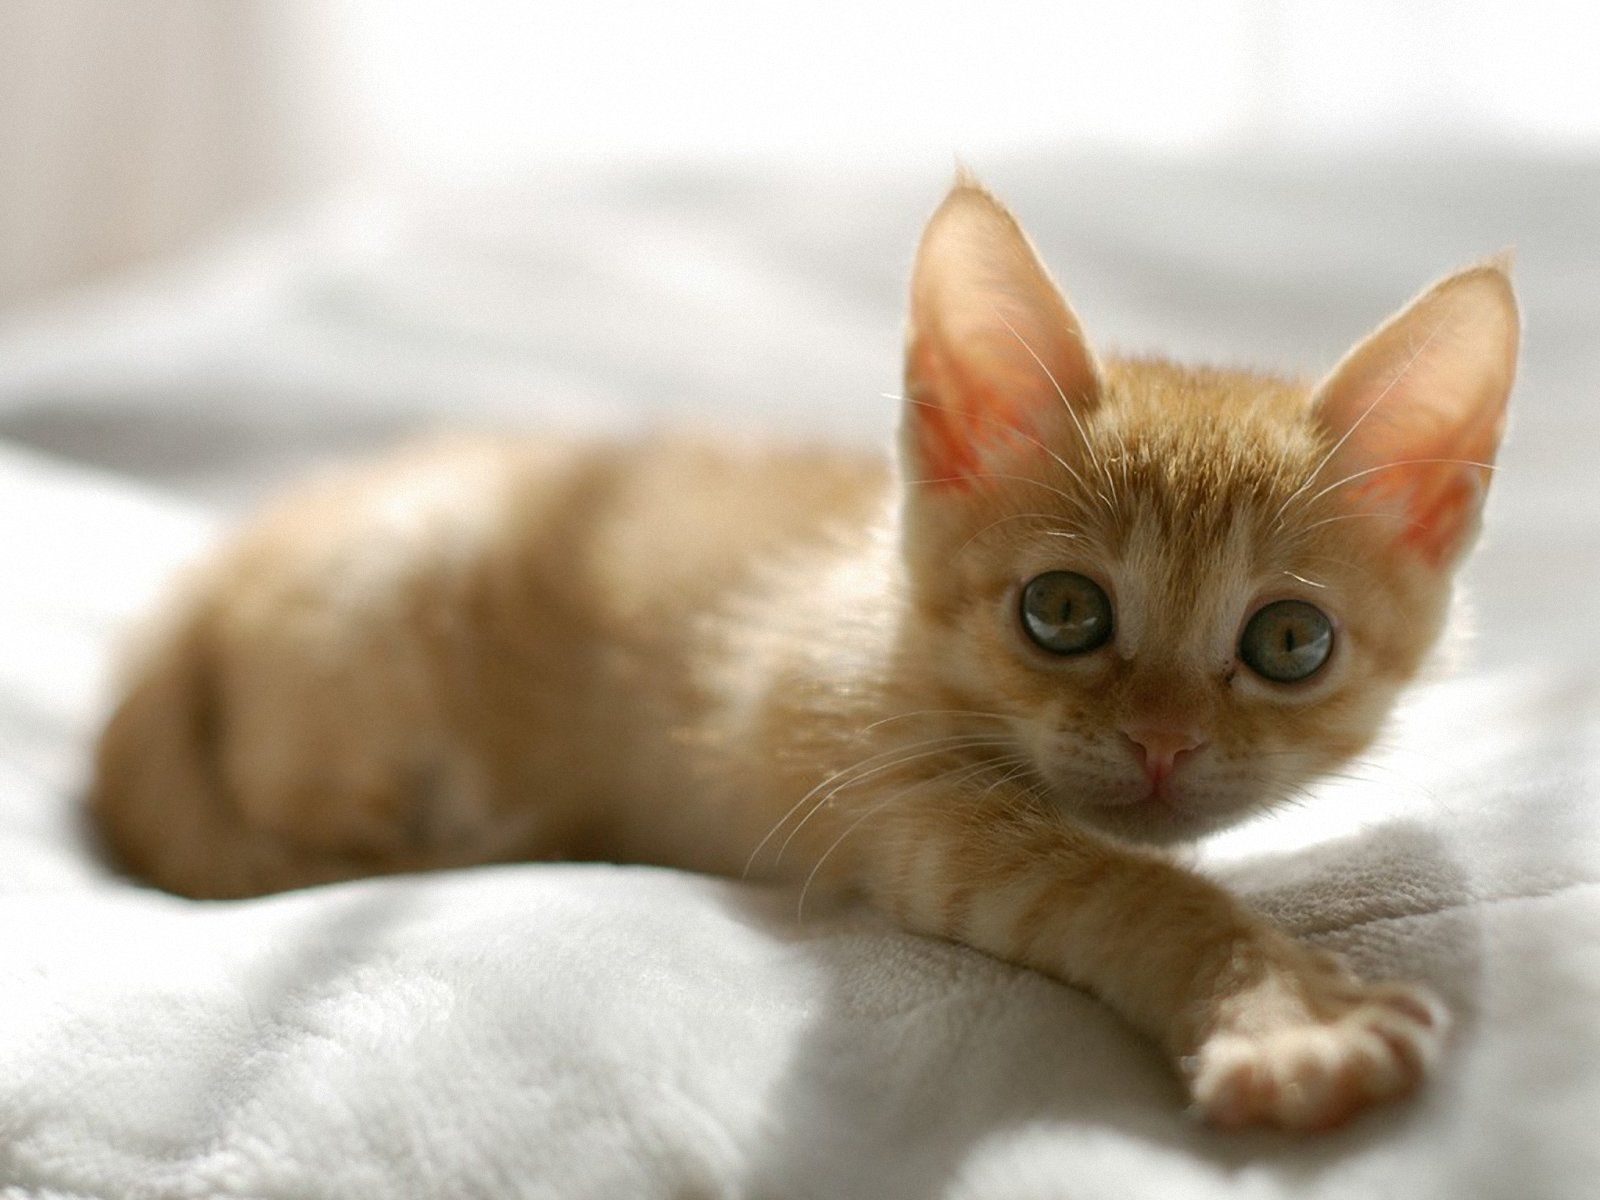 1600x1200 Cute Orange Kitten desktop PC and Mac wallpaper 1600x1200